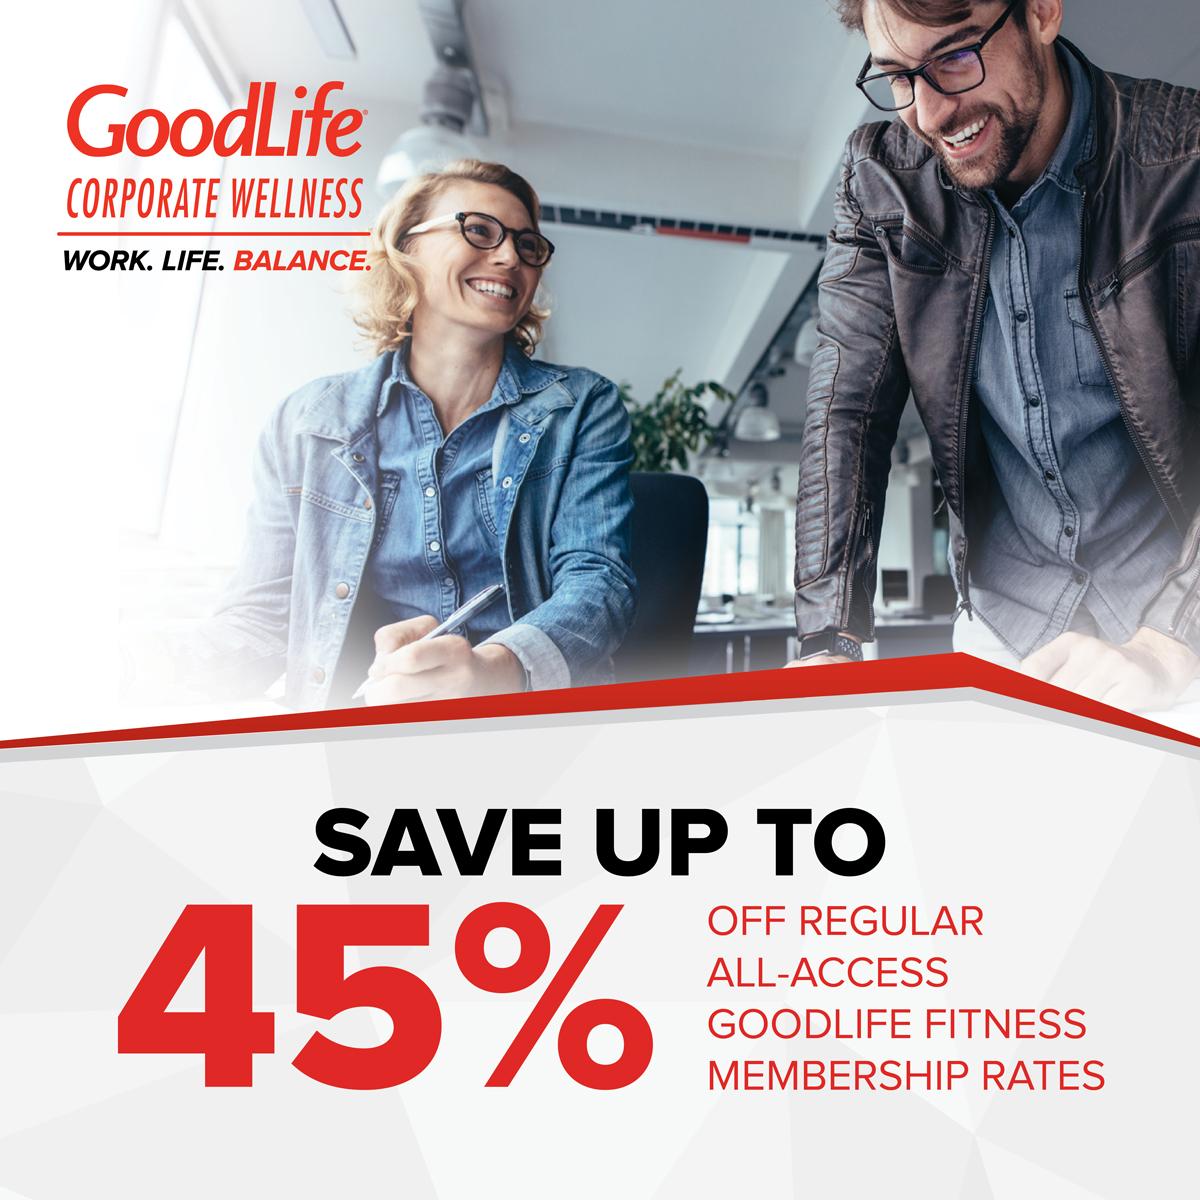 Goodlife Fitness Corporate Membership Concordia University Of Edmonton